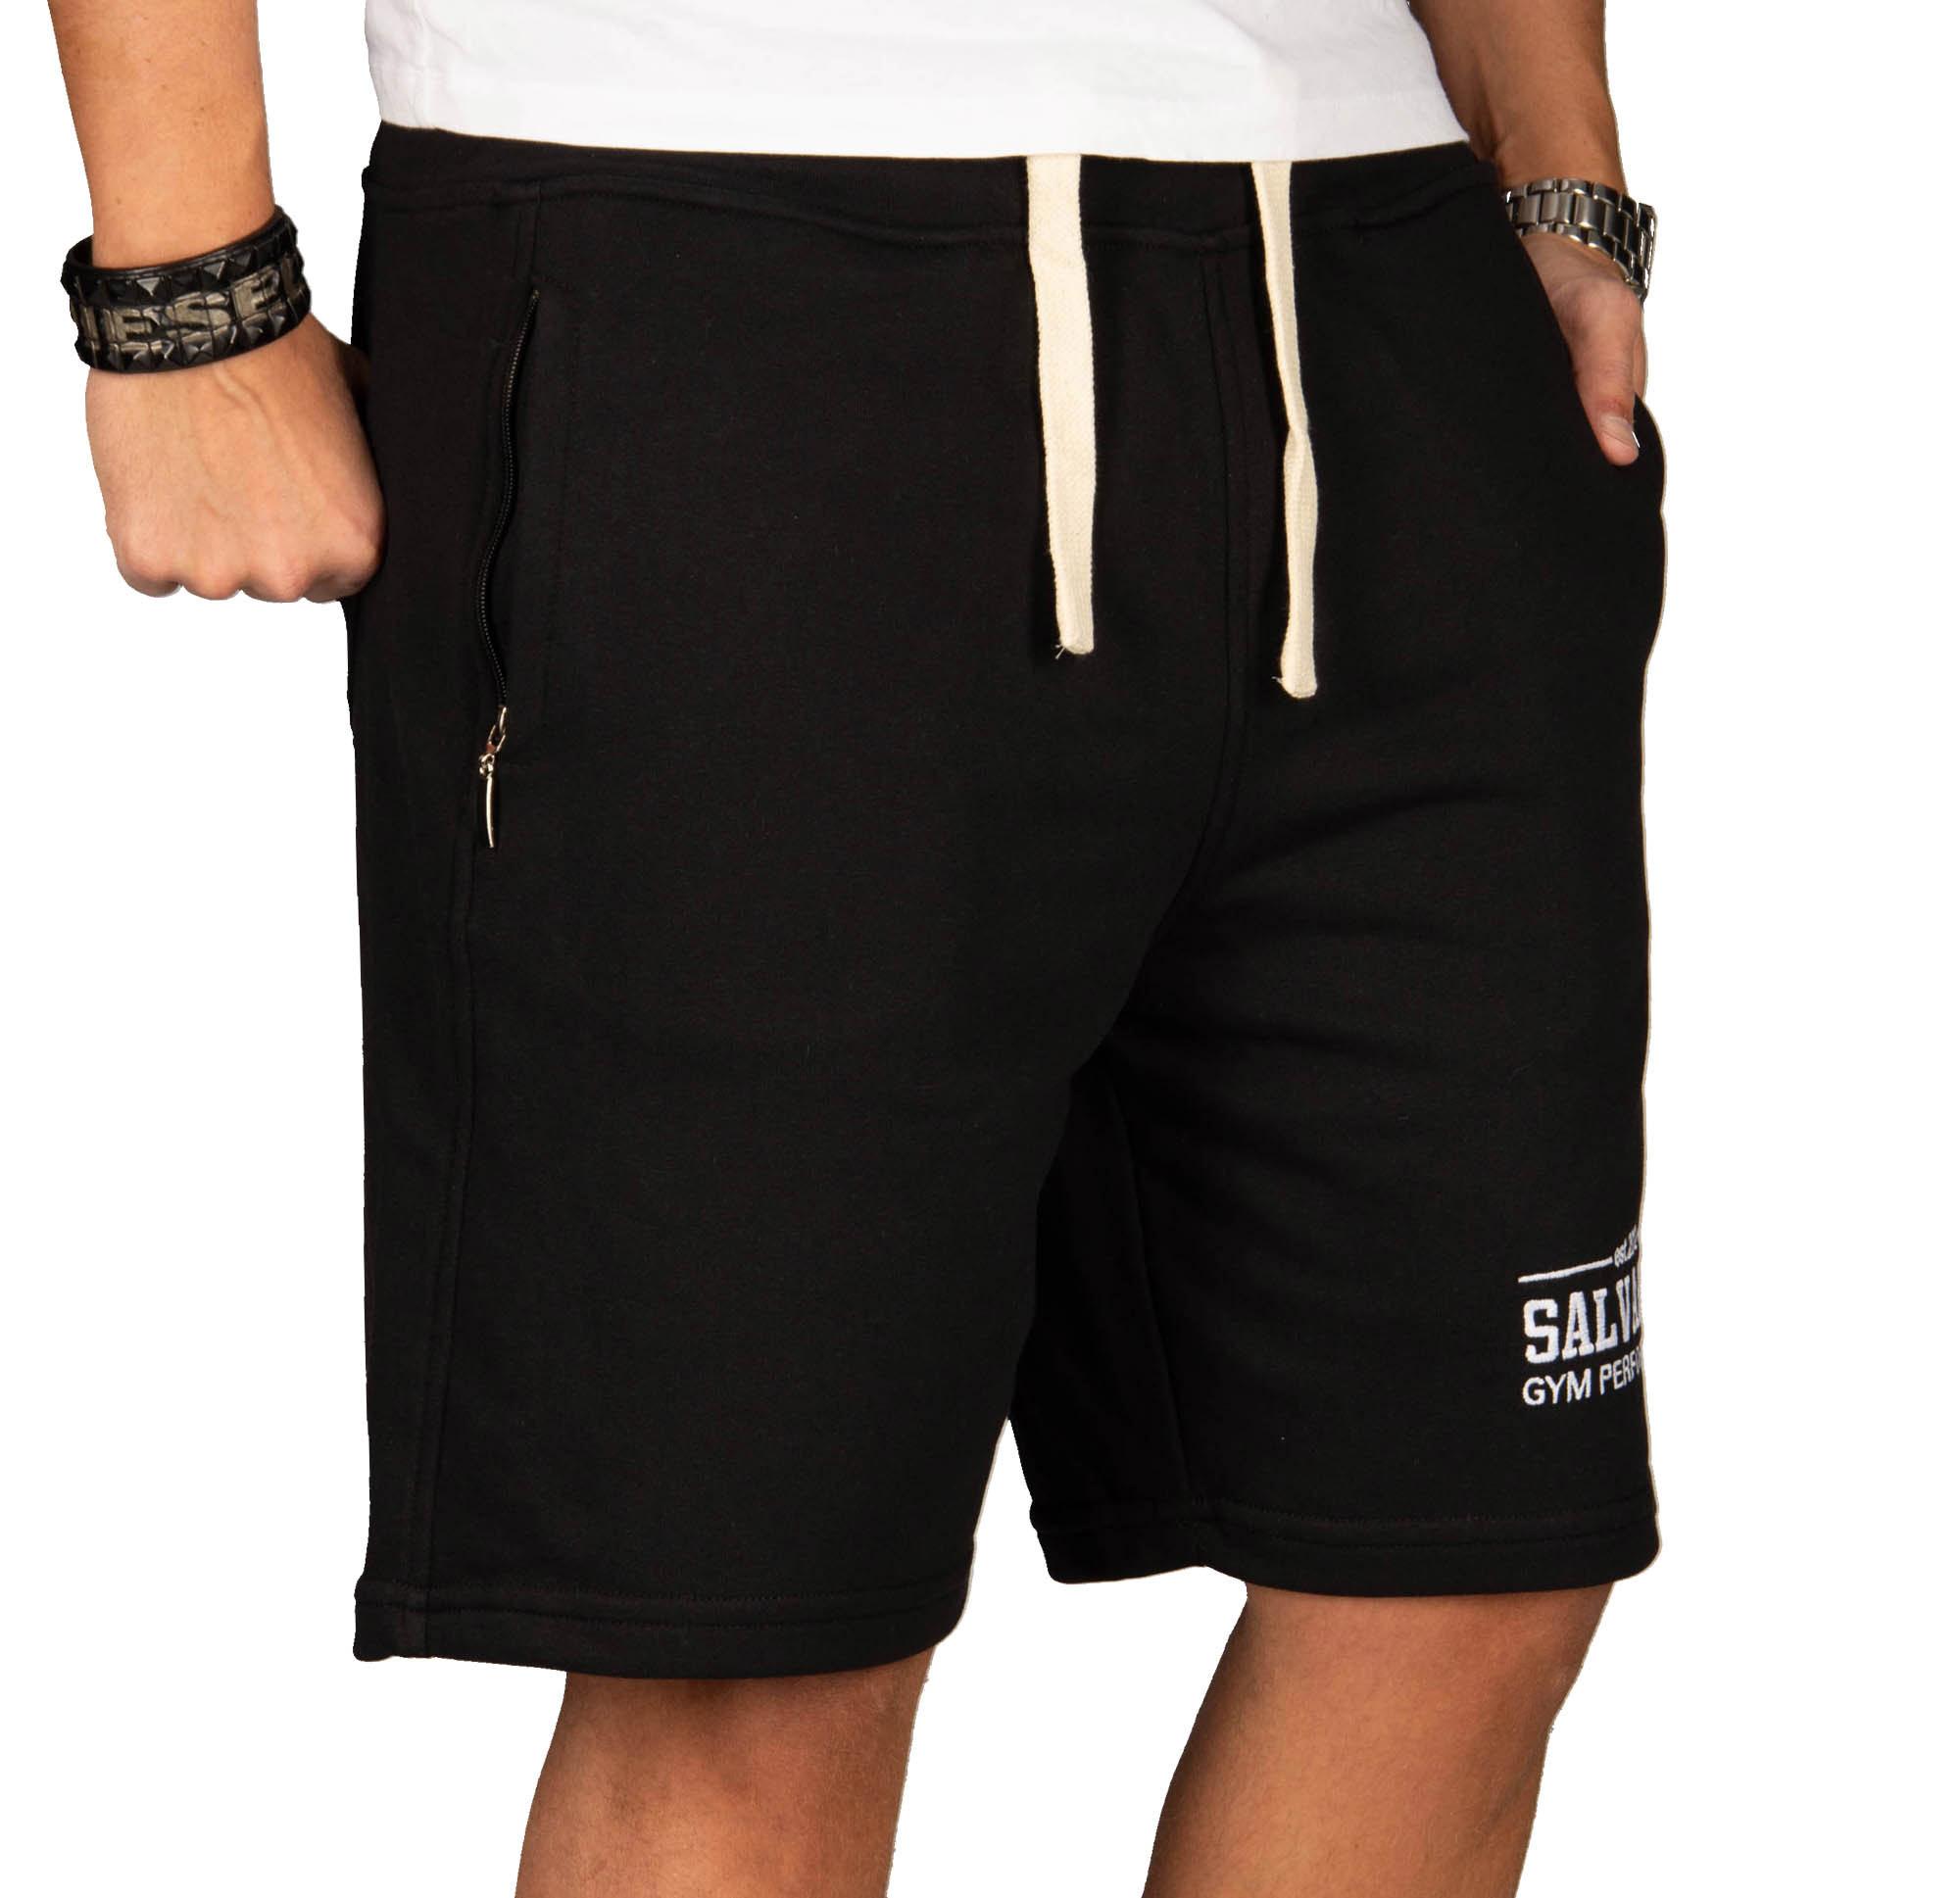 A-Salvarini-Herren-Sport-Jogging-Short-Fitness-Kurze-Hose-Trainingshose-AS130 Indexbild 3